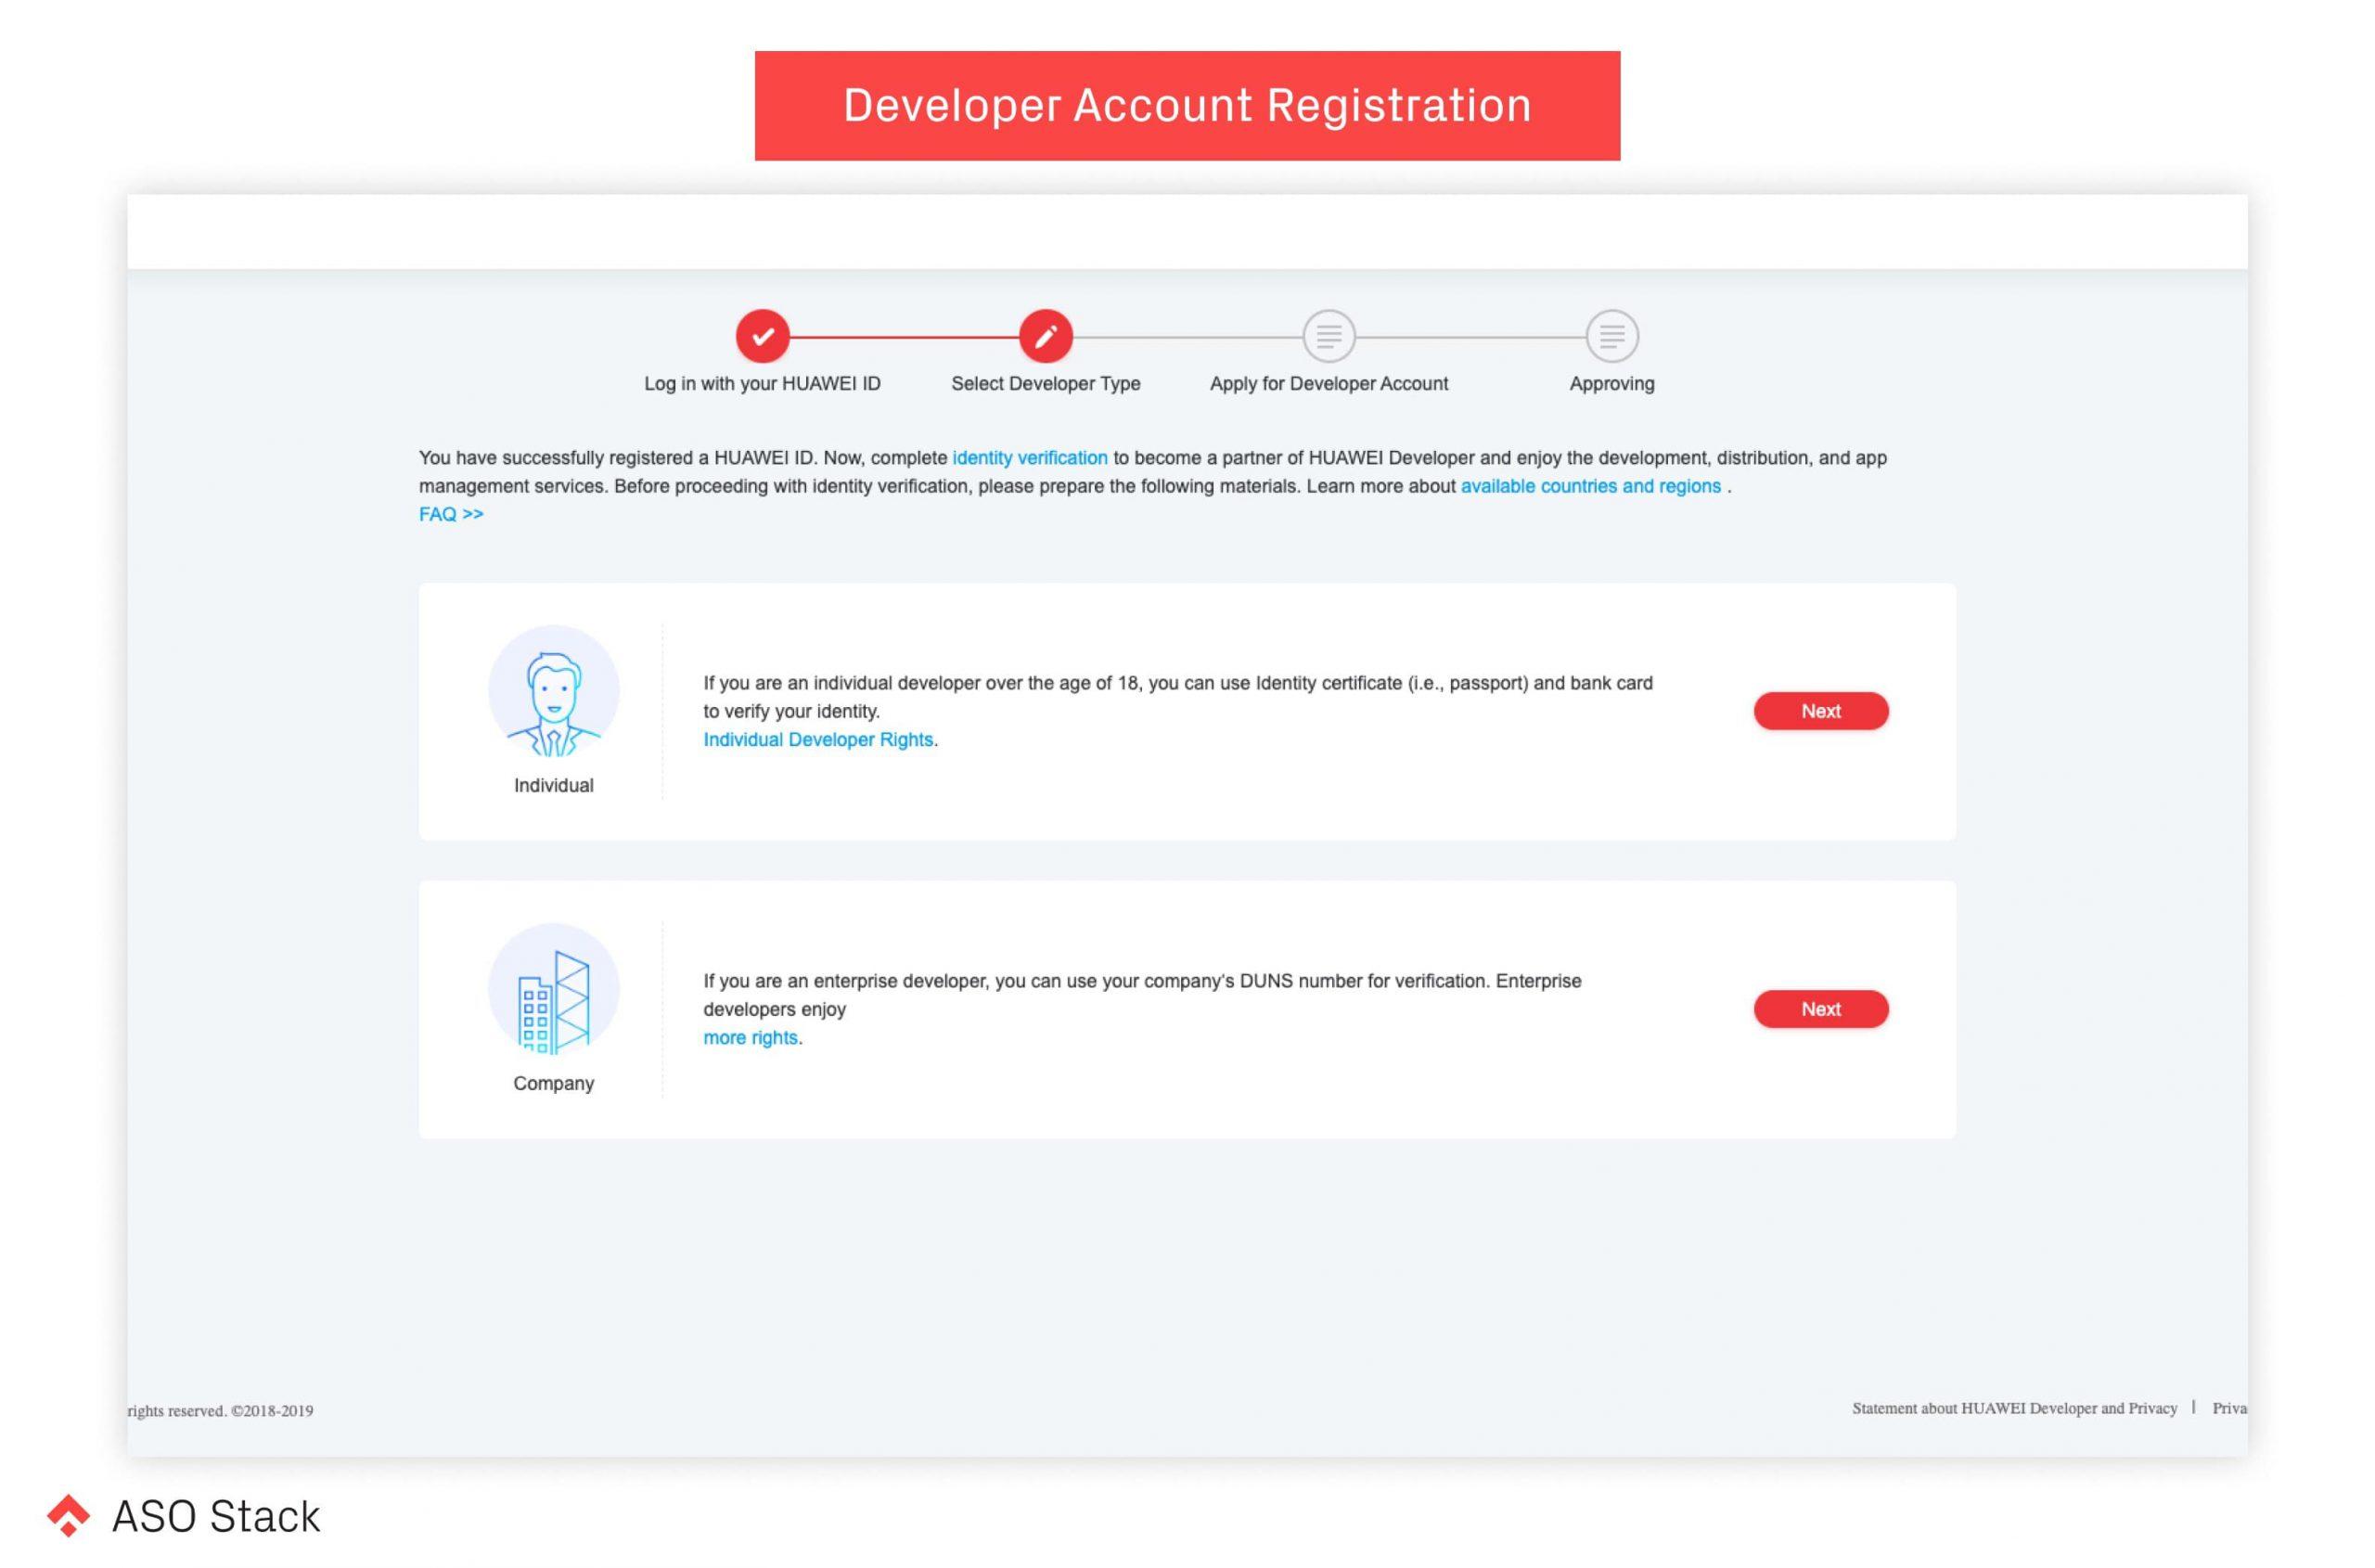 developer account registration aso stack